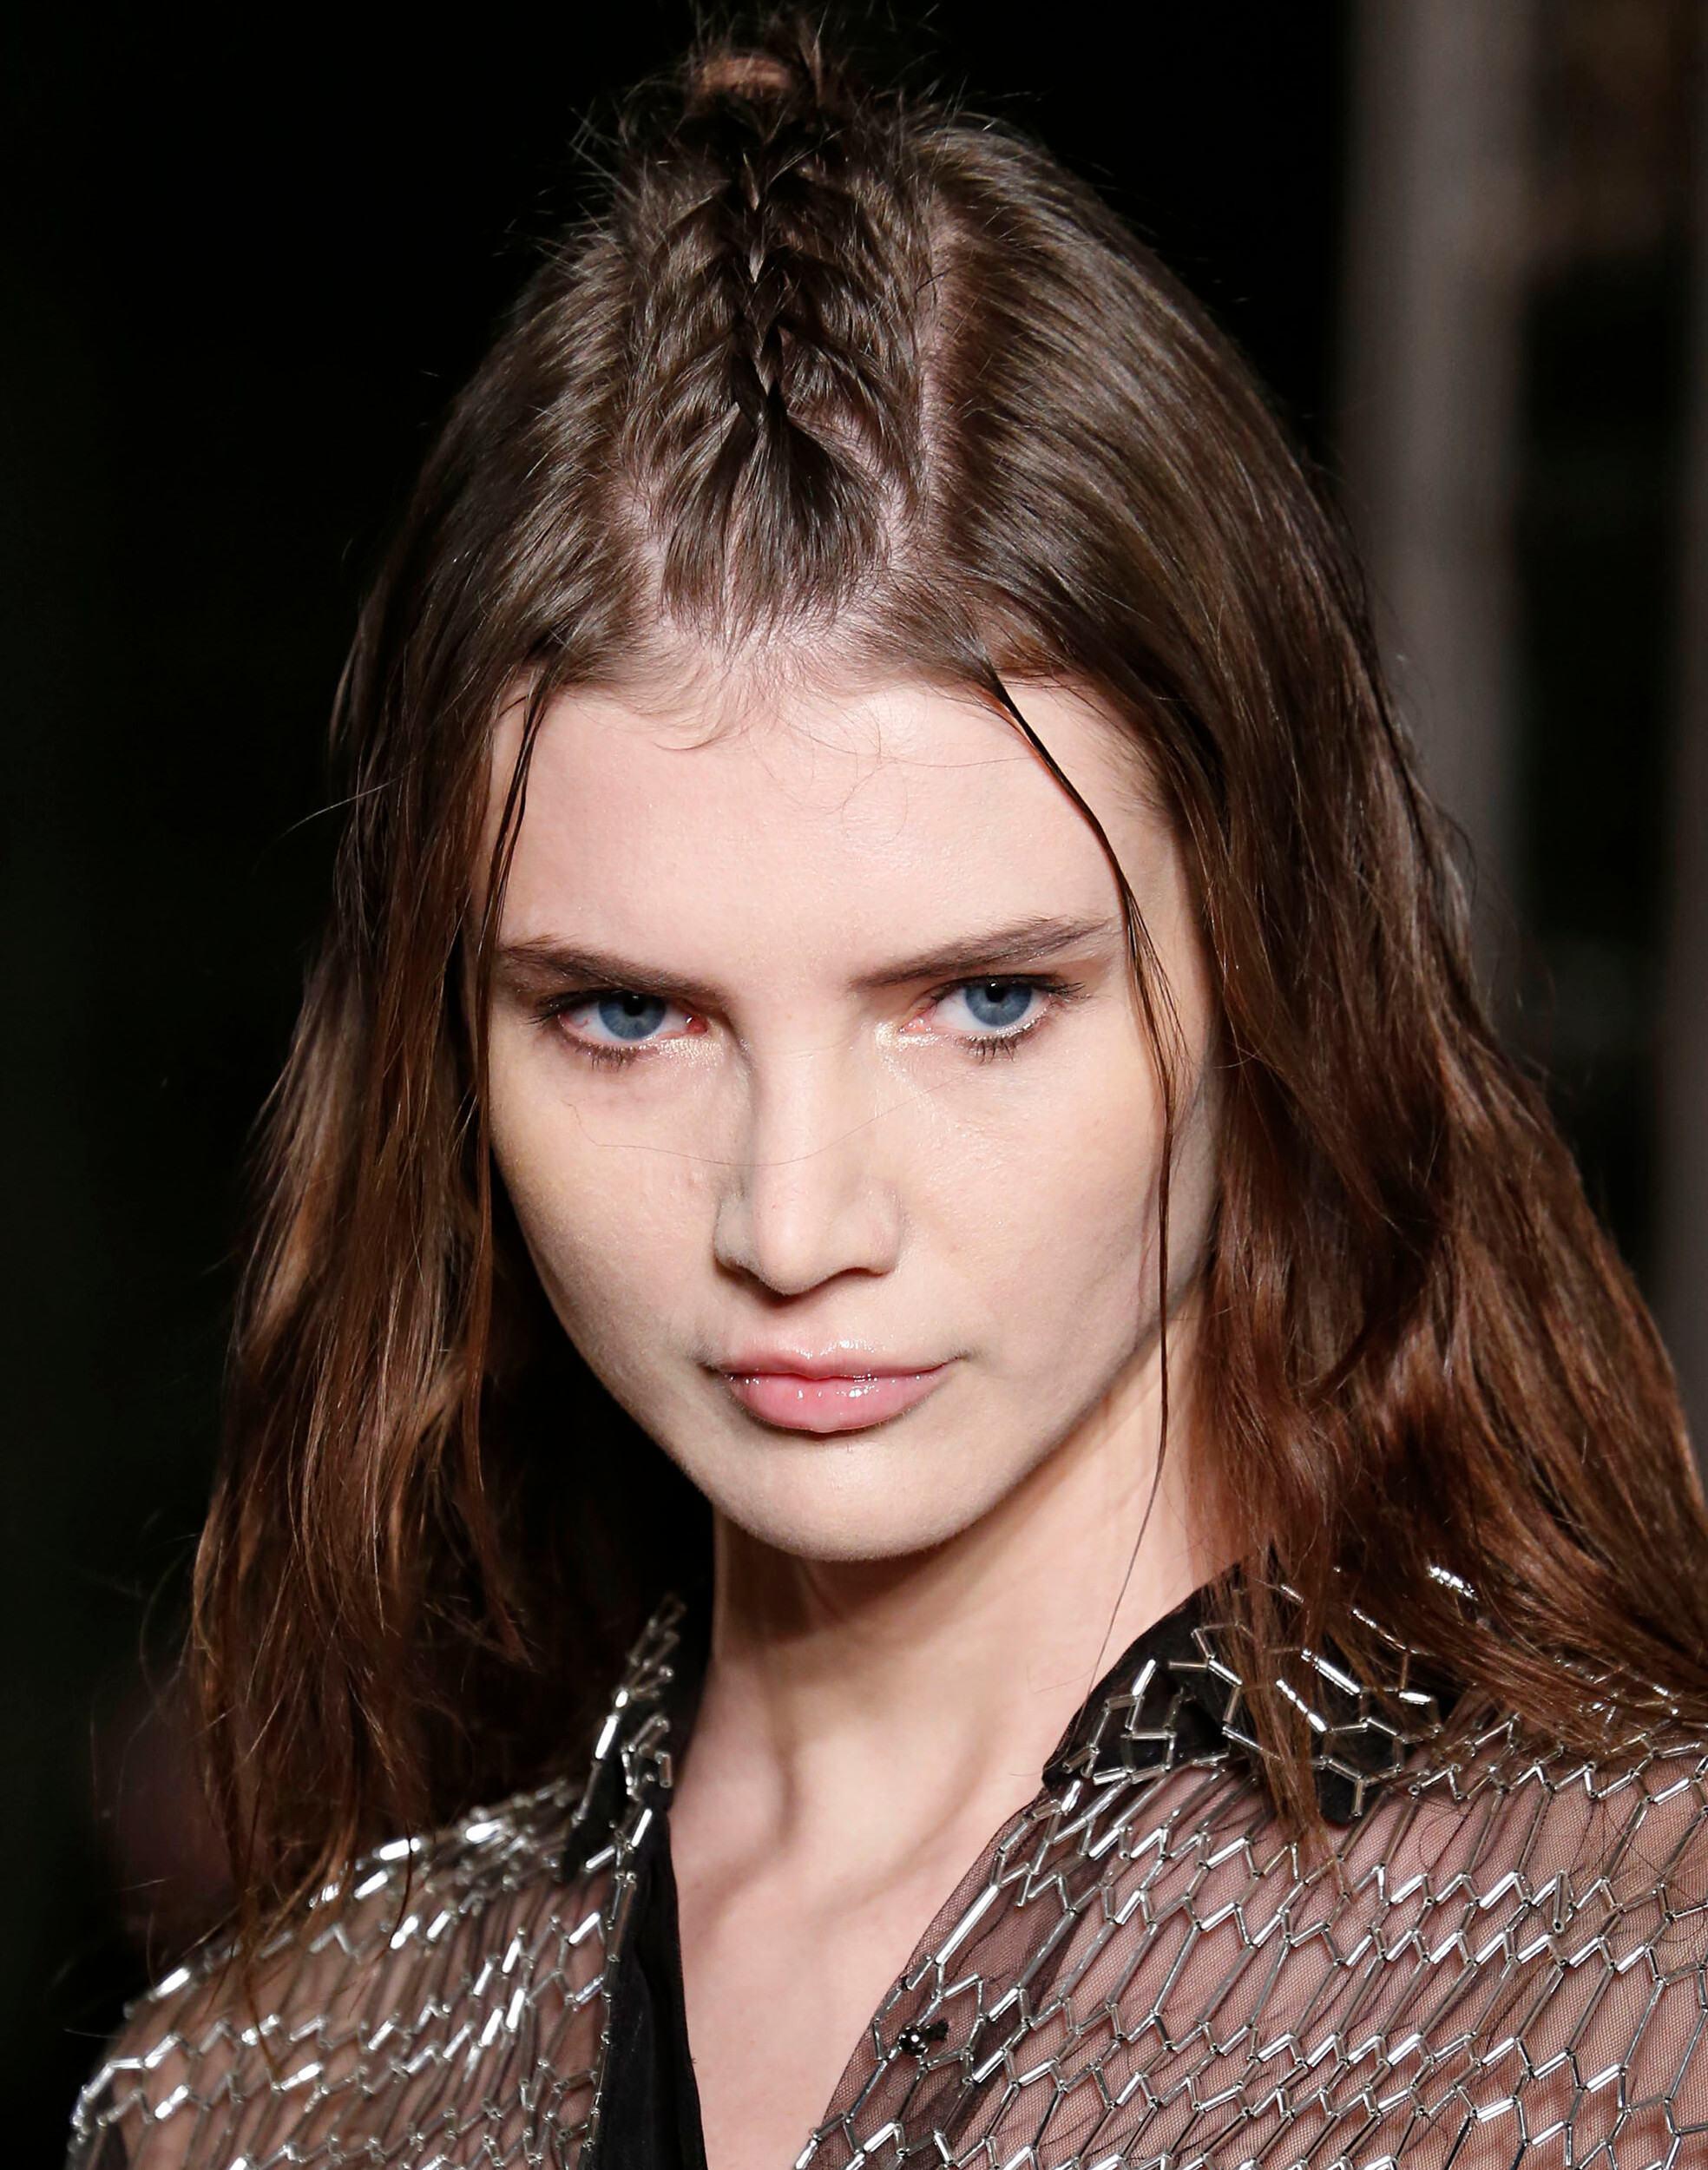 classic braid hairstyles: unicorn braid